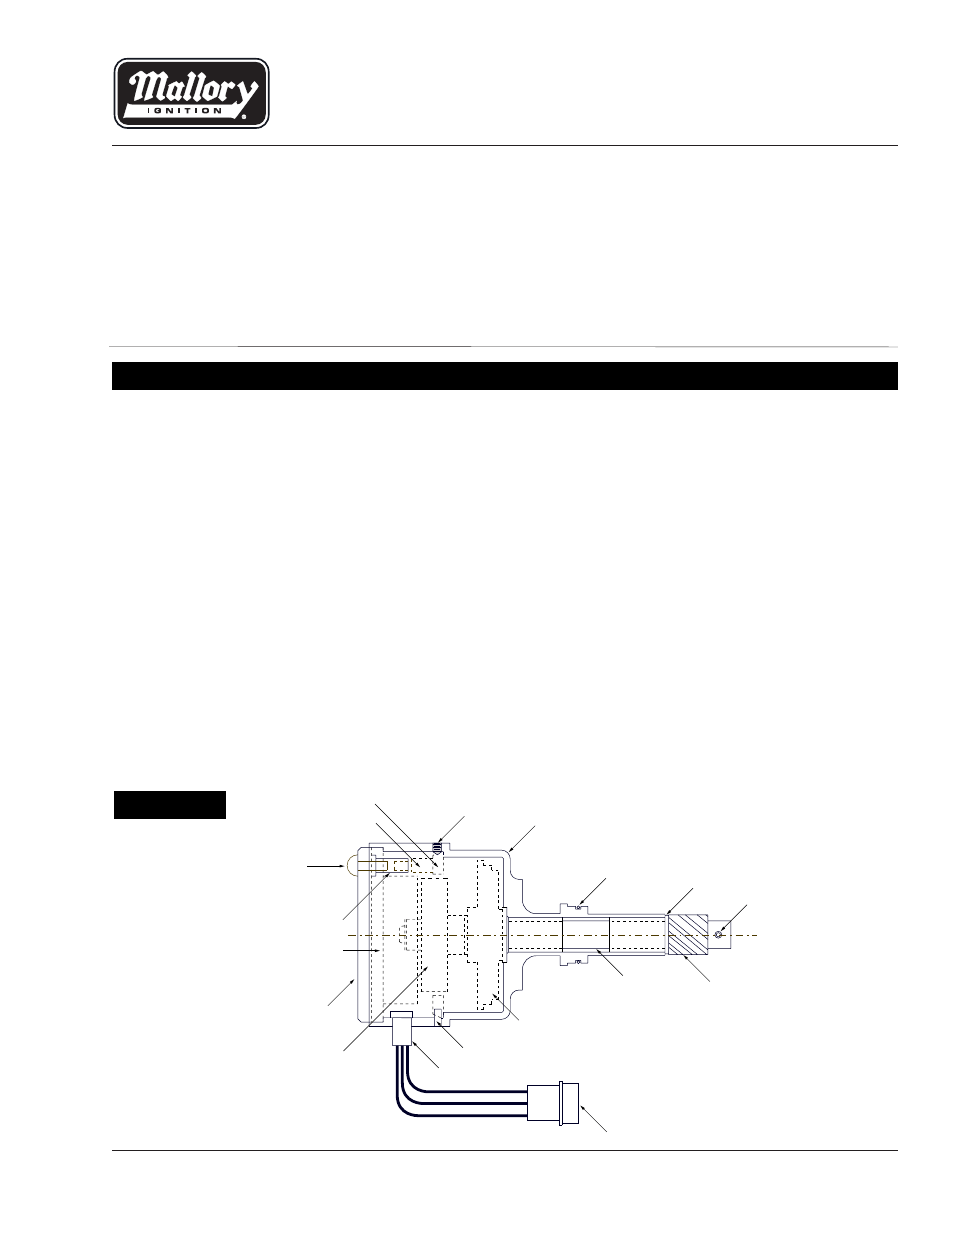 mallory unilite distributor wiring diagram   42 wiring